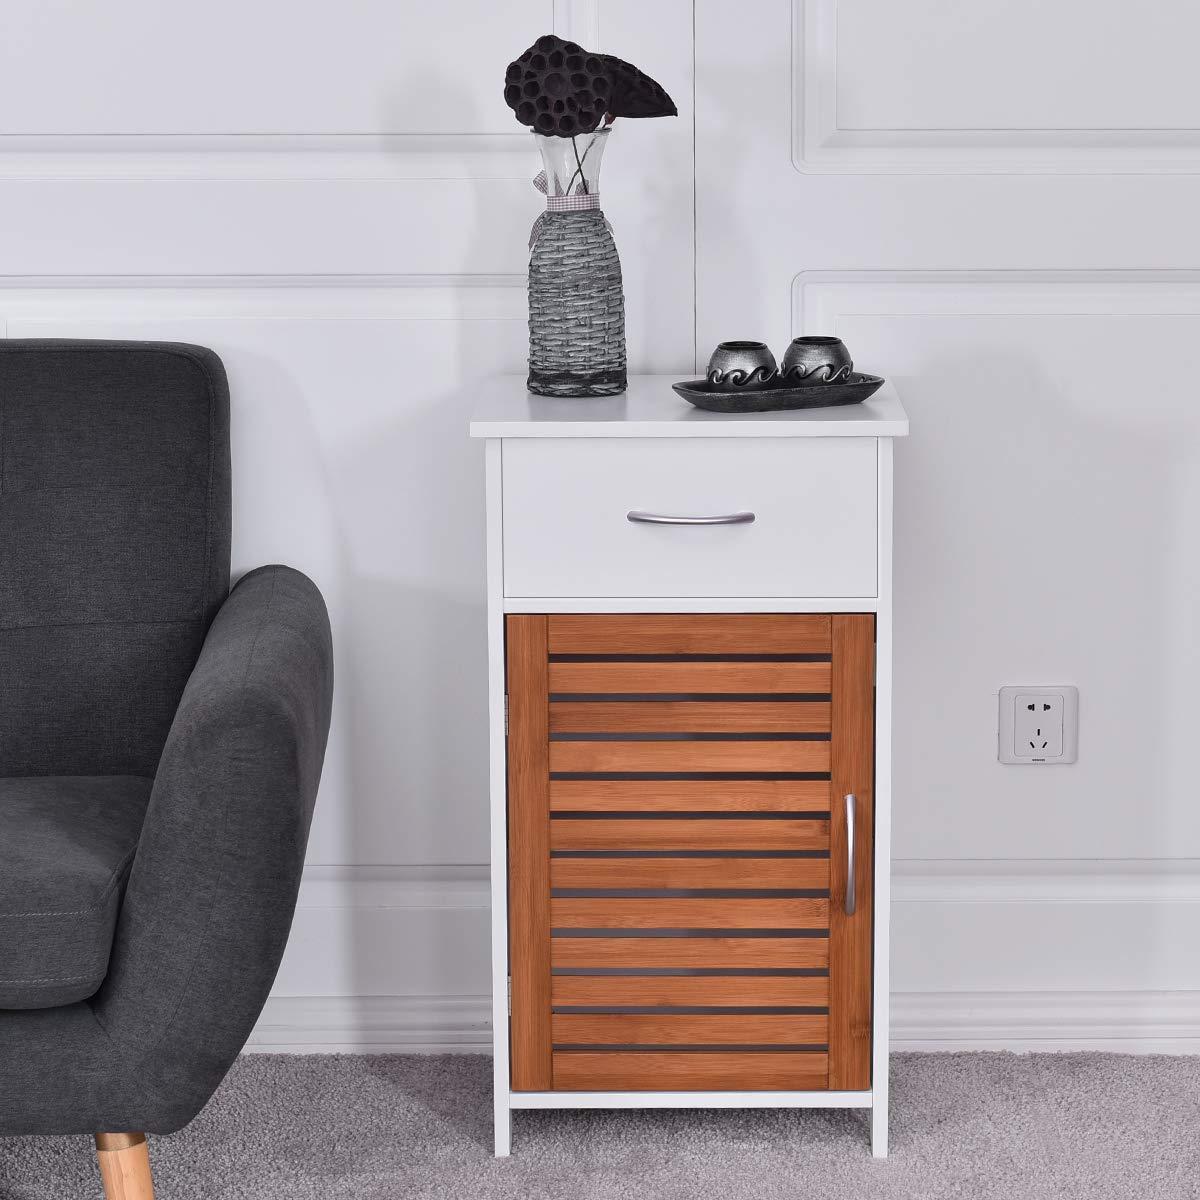 WATERJOY Storage Cabinet, Wooden Floor Cabinet with Shutter Door and Drawer, Elegant Bedside Cabinet for Bathroom, Bedroom and Living Room, White